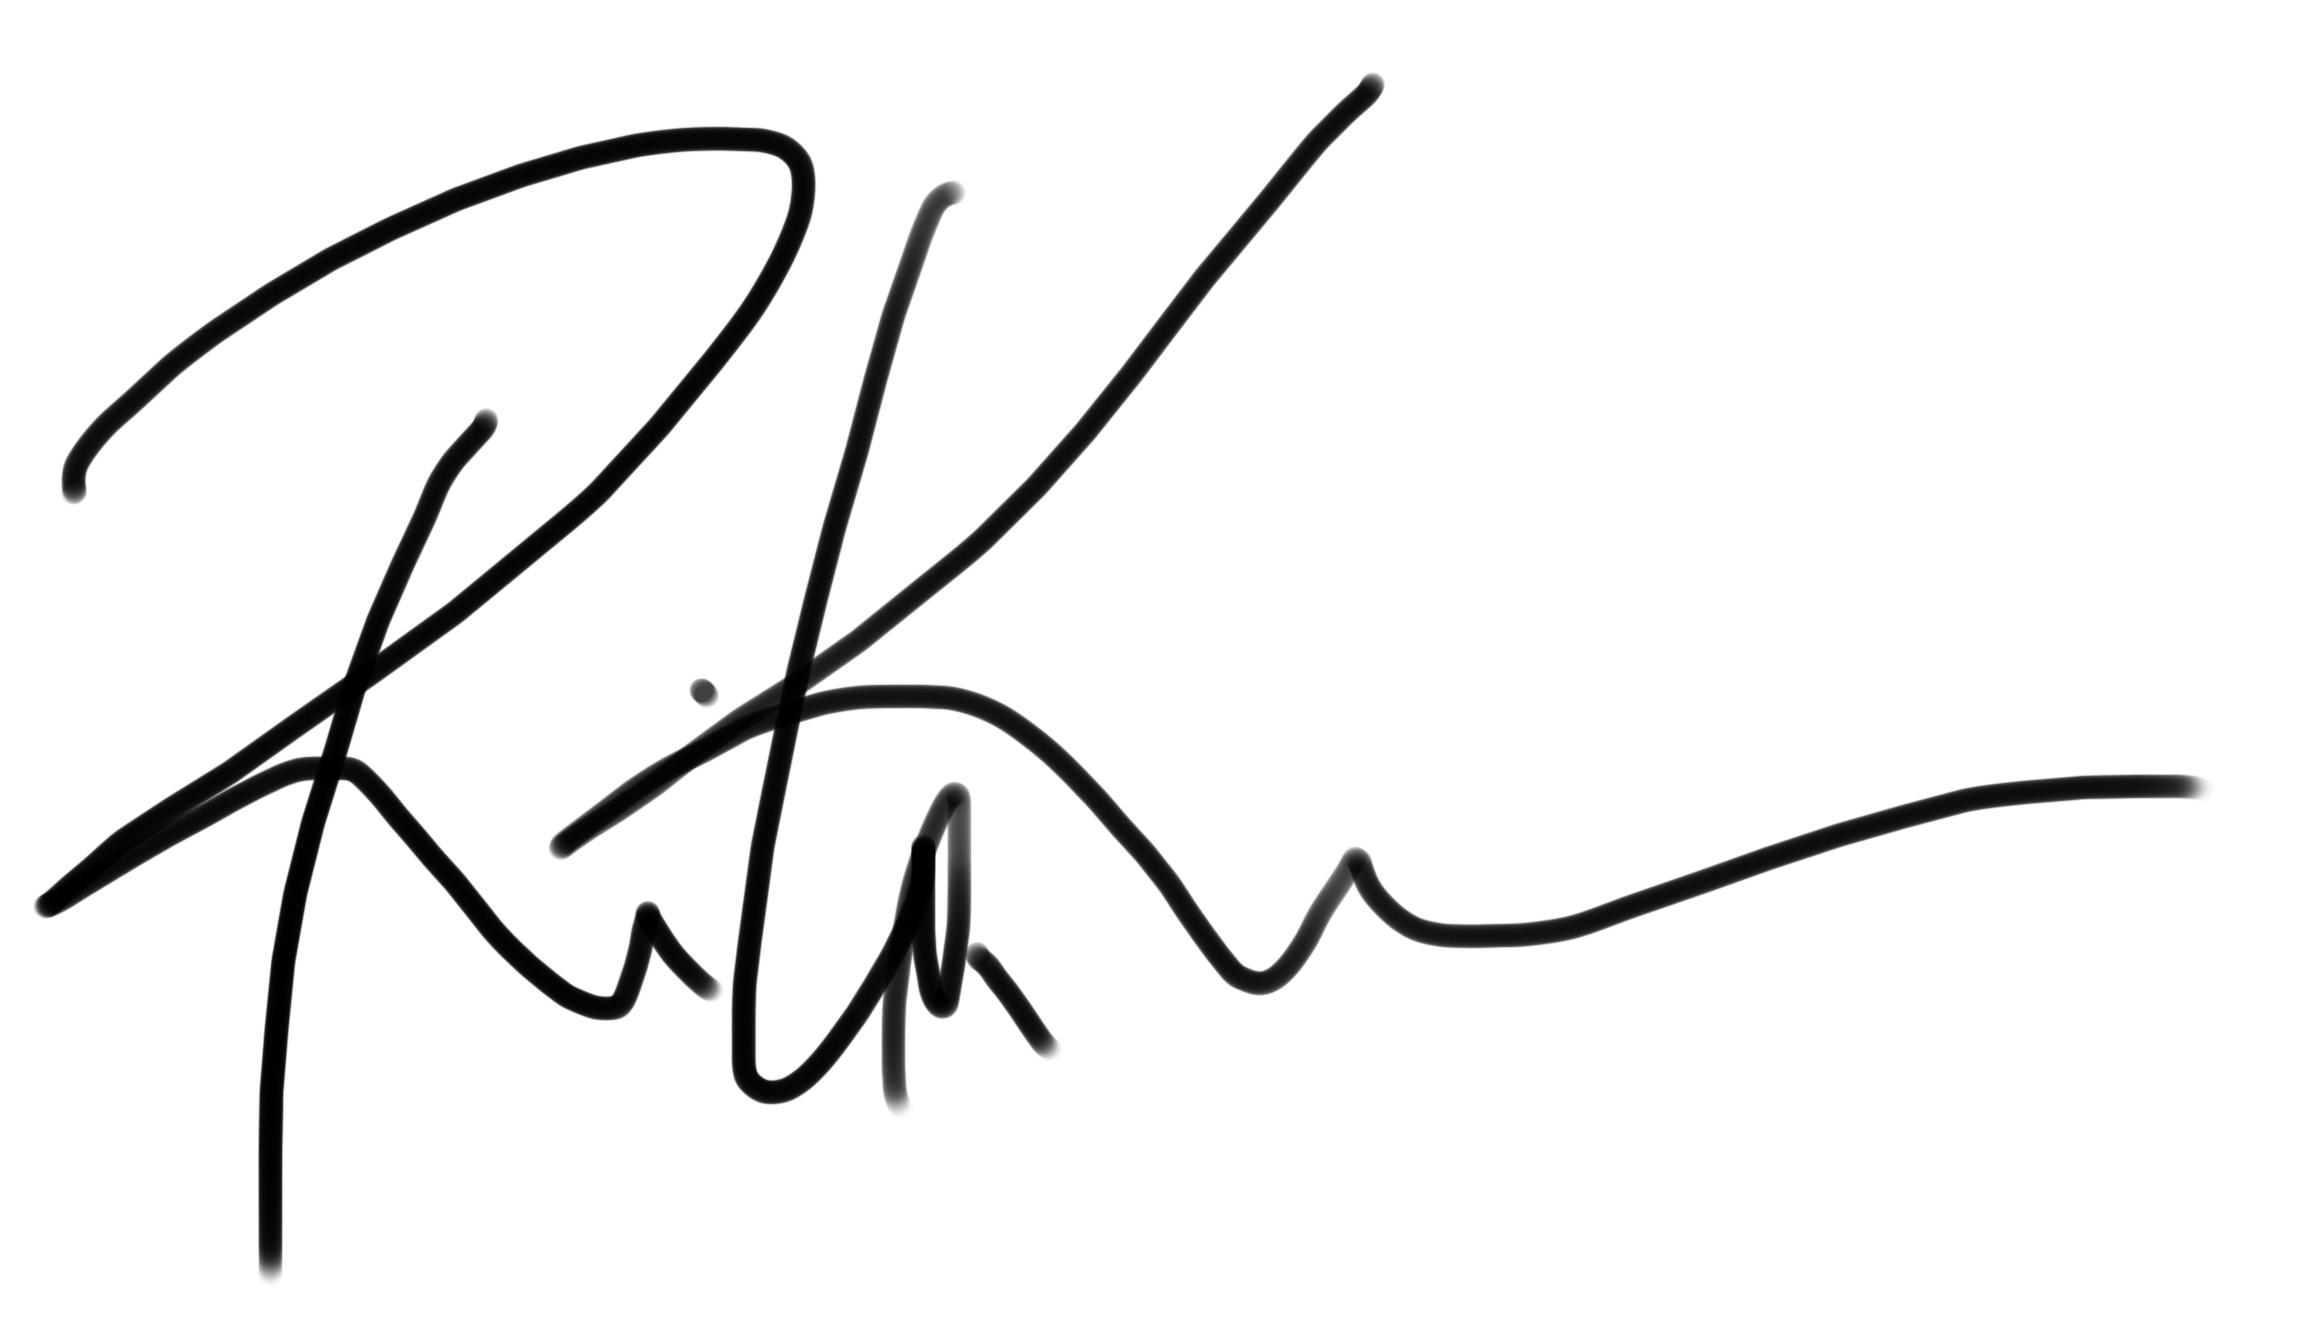 rita karam's Signature